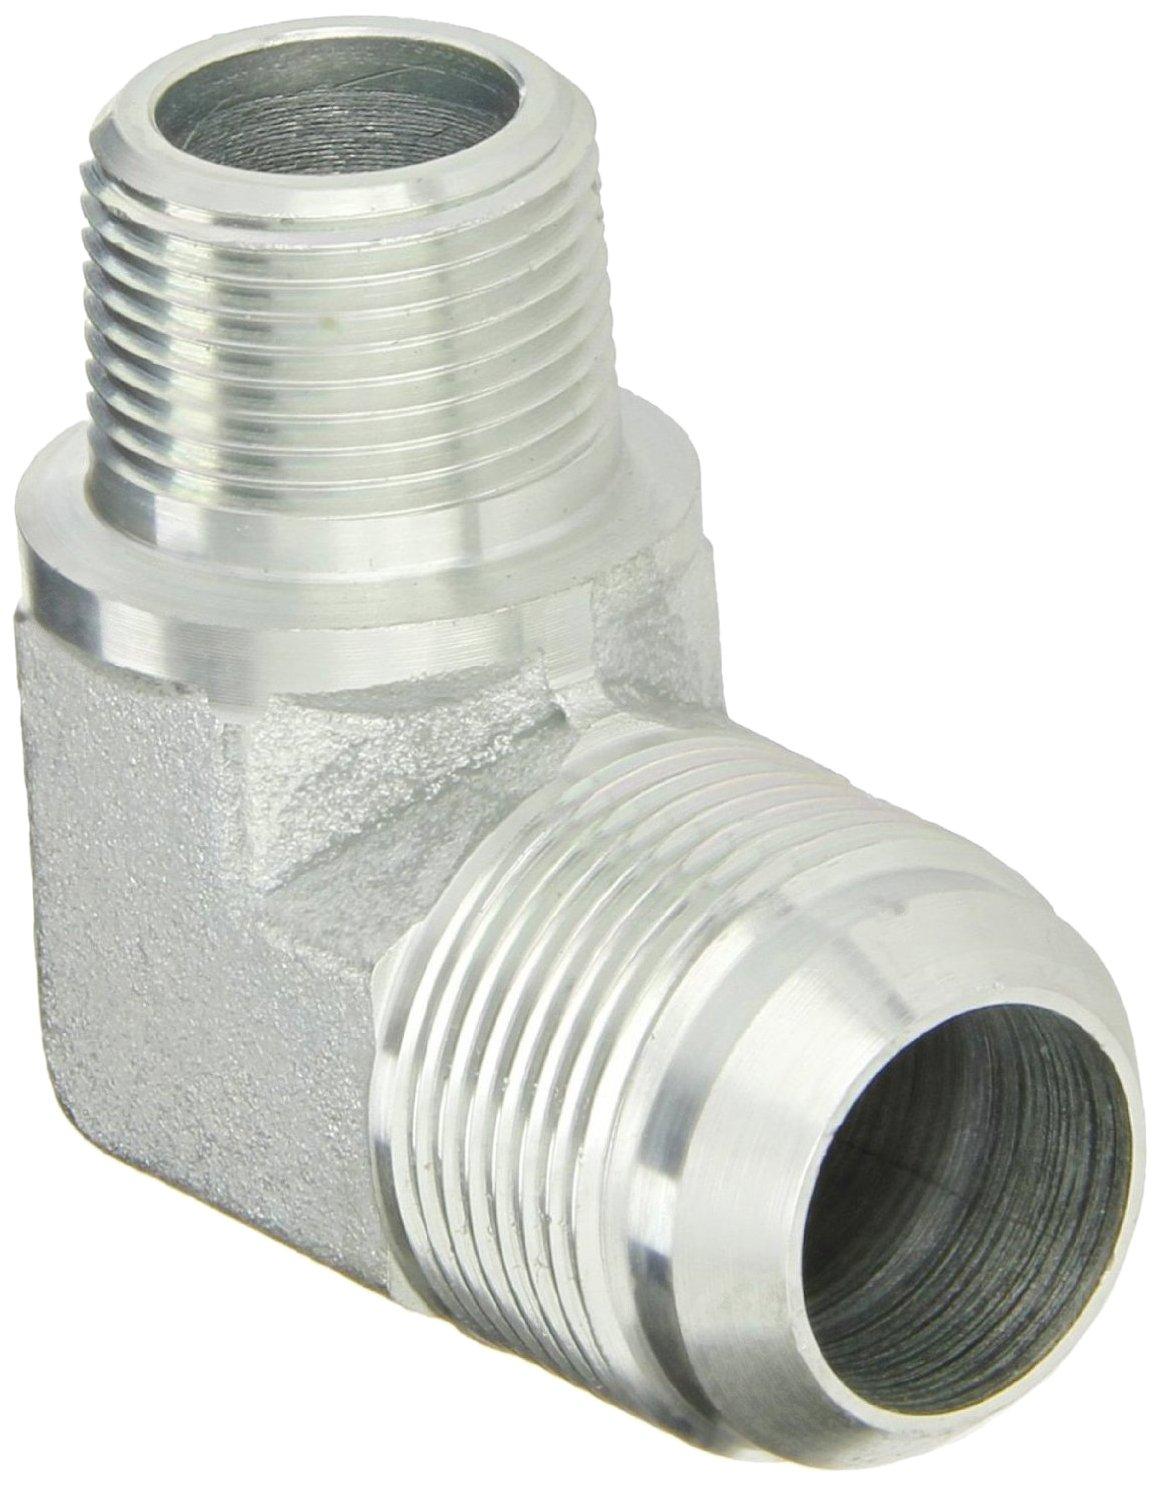 JIC 37 Degree End Types Carbon Steel m 3//8 JIC 3//8 Tube OD Eaton Aeroquip 2043-6-6S 90 Degree Bulkhead Union Elbow End Size